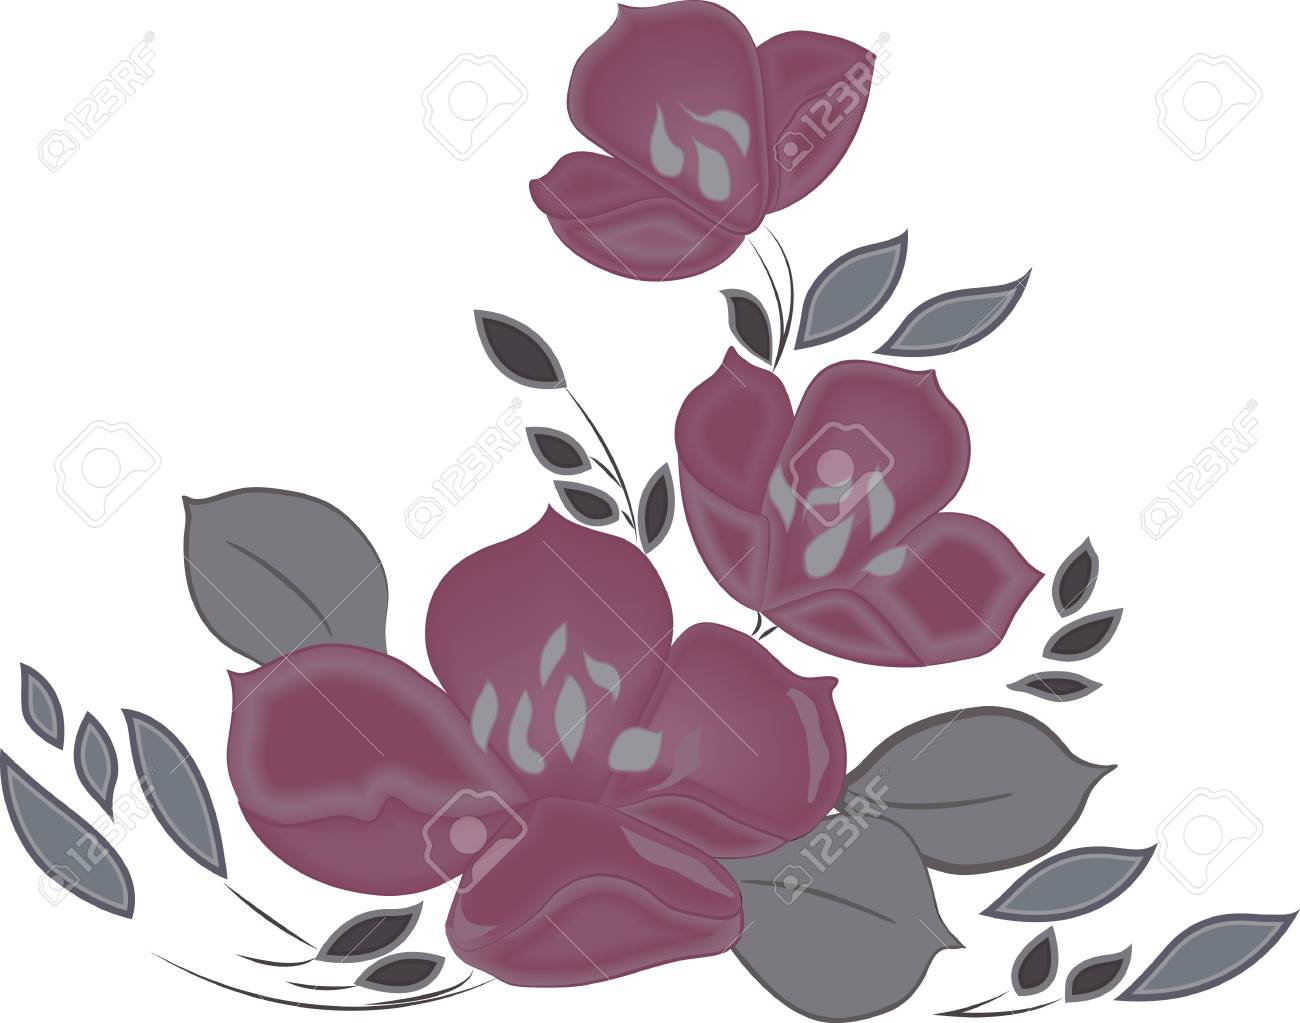 Hand-drawing floral background  Element for design  Vector illustration Stock Vector - 19324546